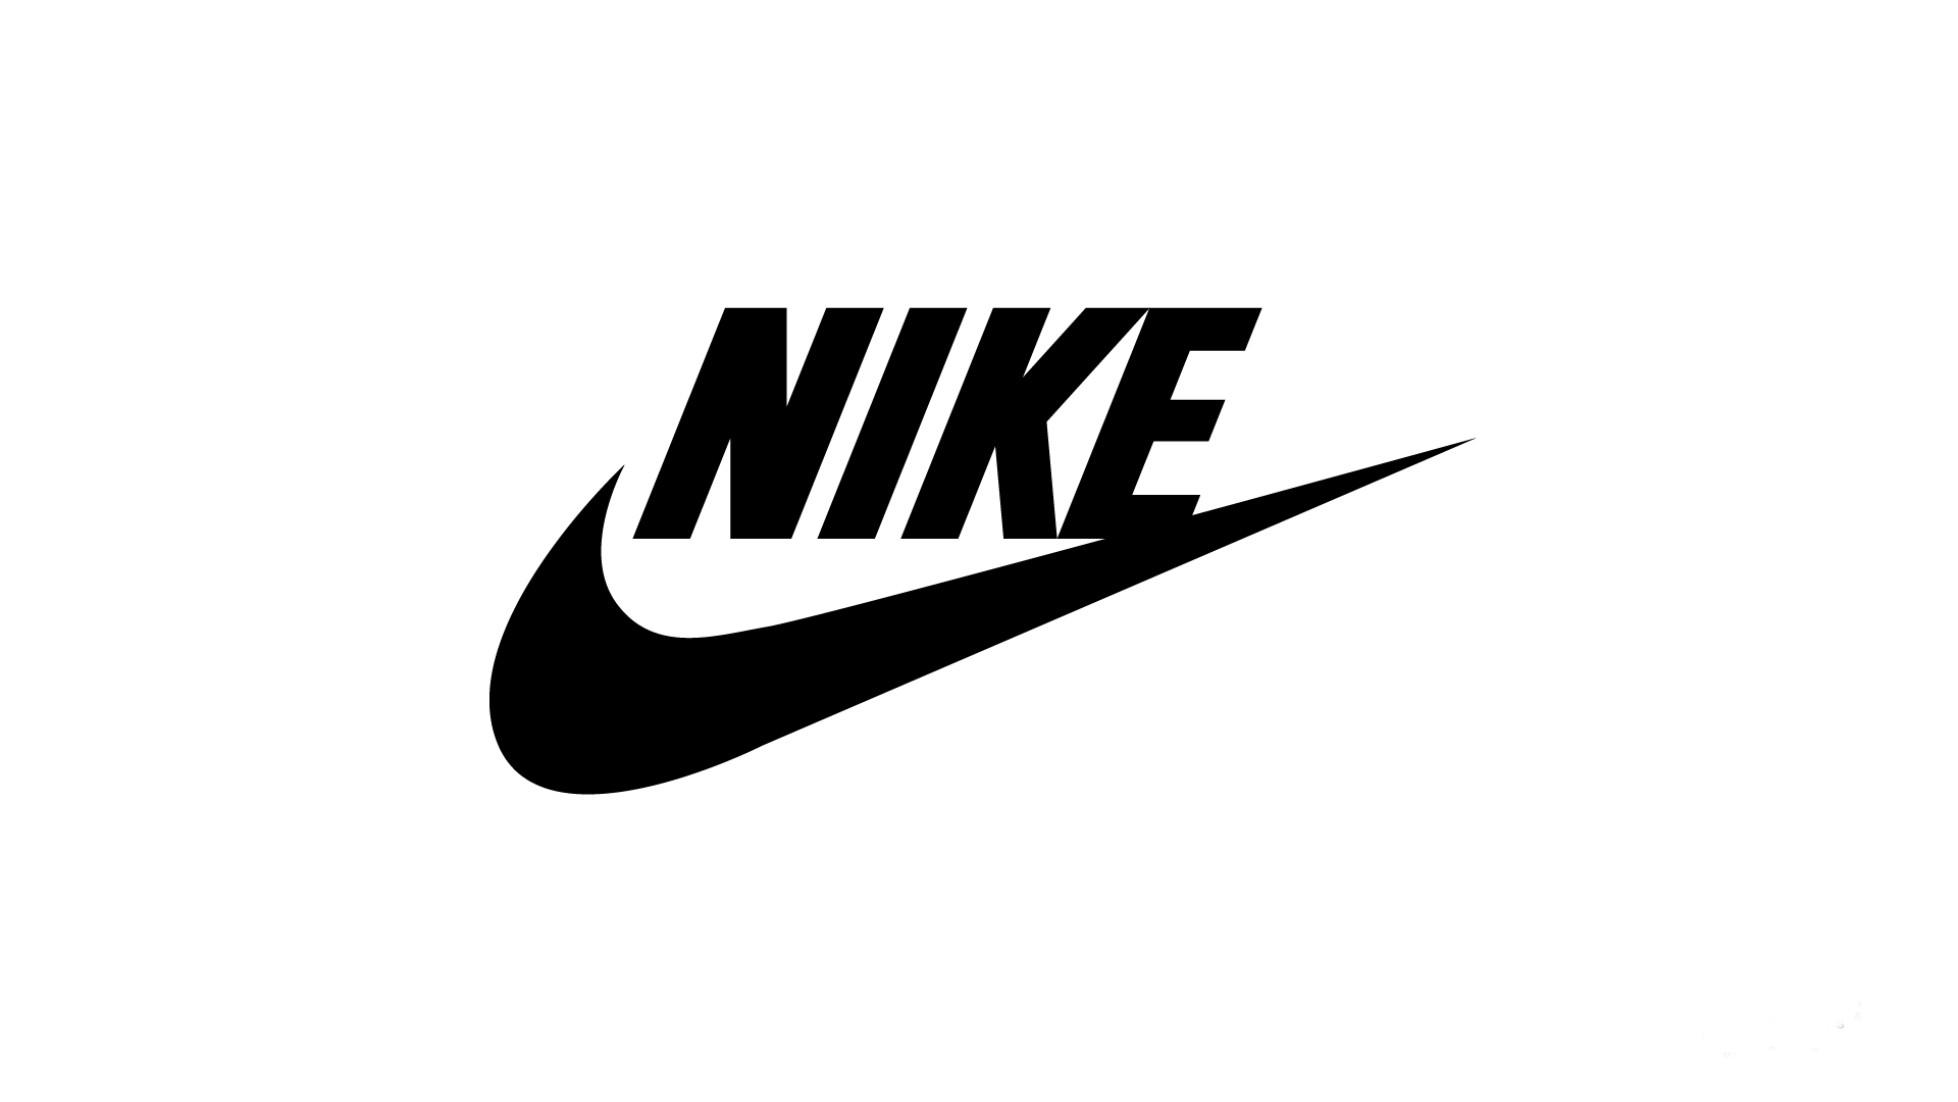 Res: 1958x1102, Nike Wallpaper HD Simple White